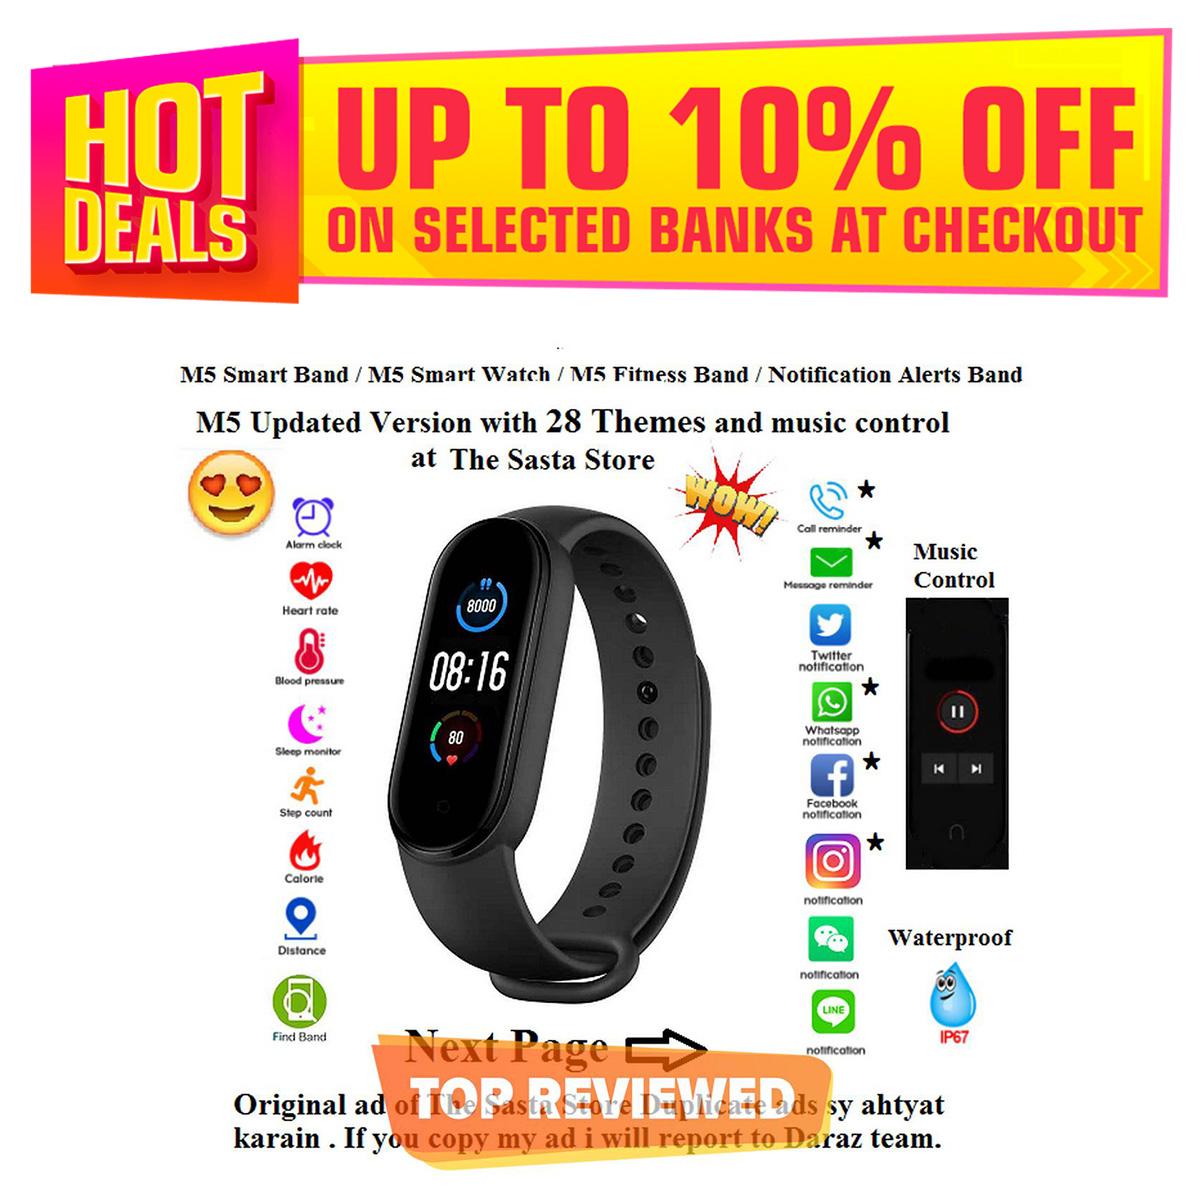 M5 smart band / m5 smart watch / m5 fitness band / Original High Quality M5   / M5 Smart Bracelet / Smart Band M5 / Wrist Watch / M5 Wireless Bluetooth Smart Watch / Band Watch / Wireless Bracelet / Fitness Band/ Heart Rate Tracker / Step Count Band